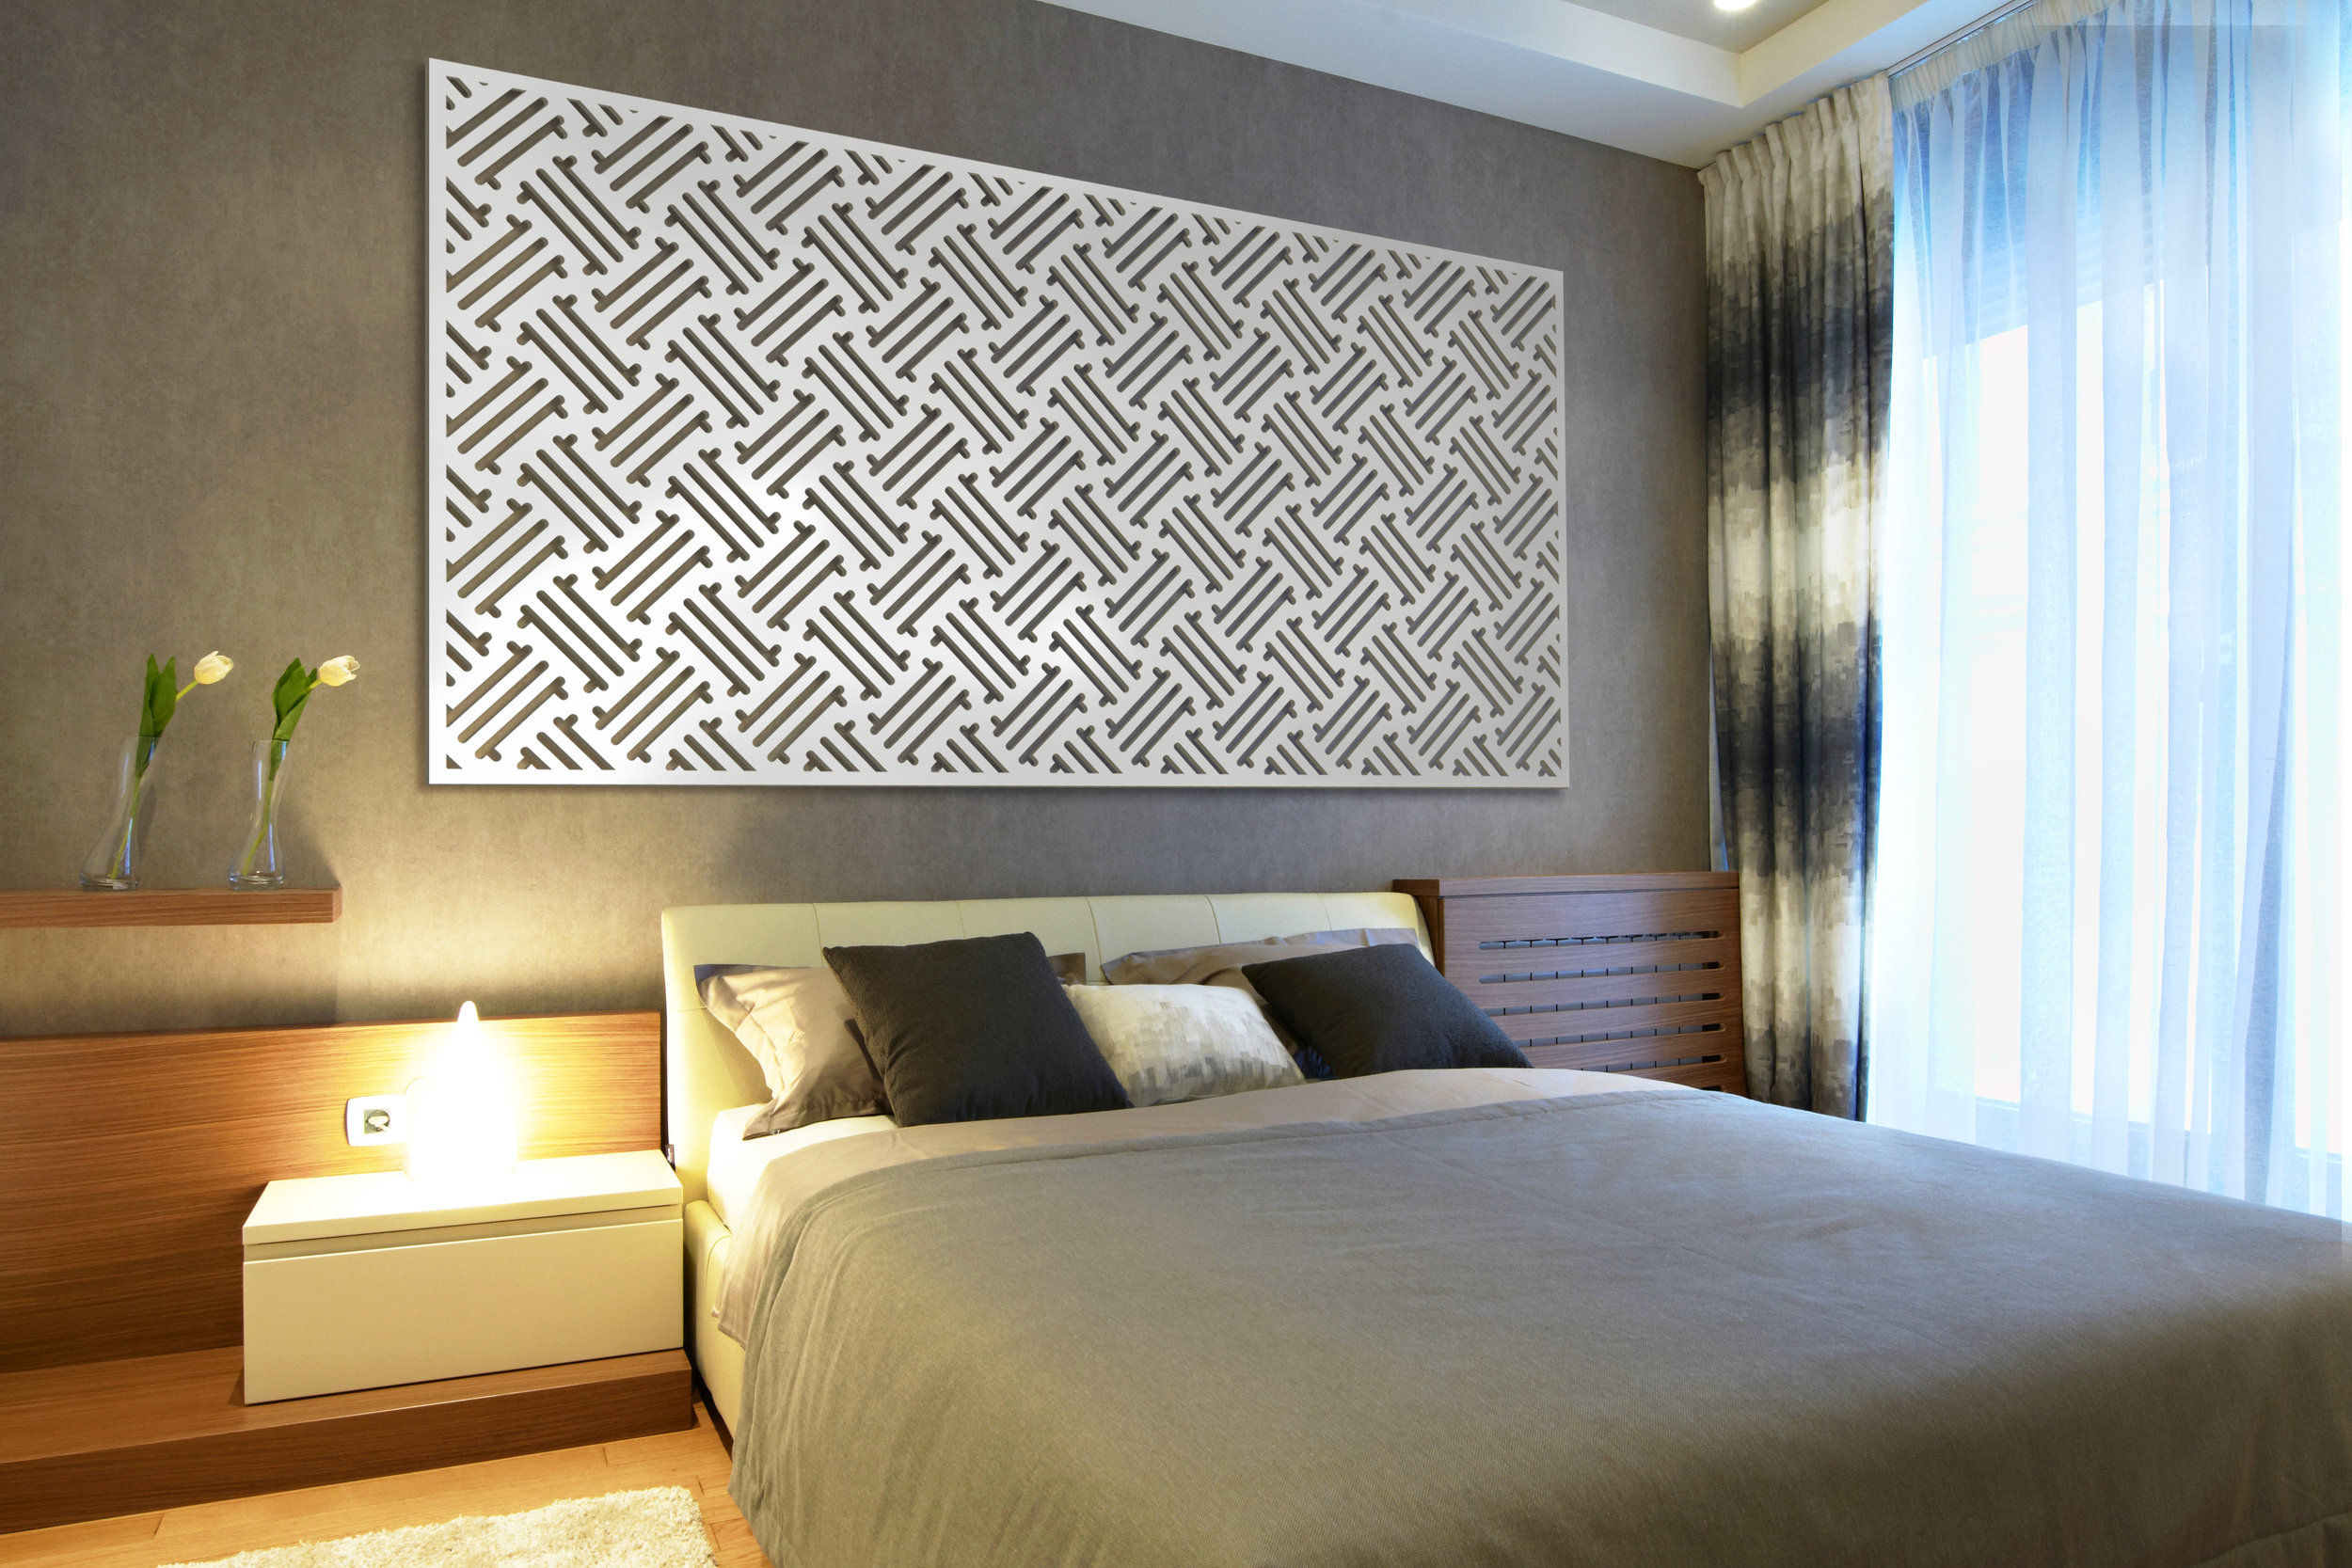 Installation Rendering C   Hawaiian decorative hotel wall panel - painted